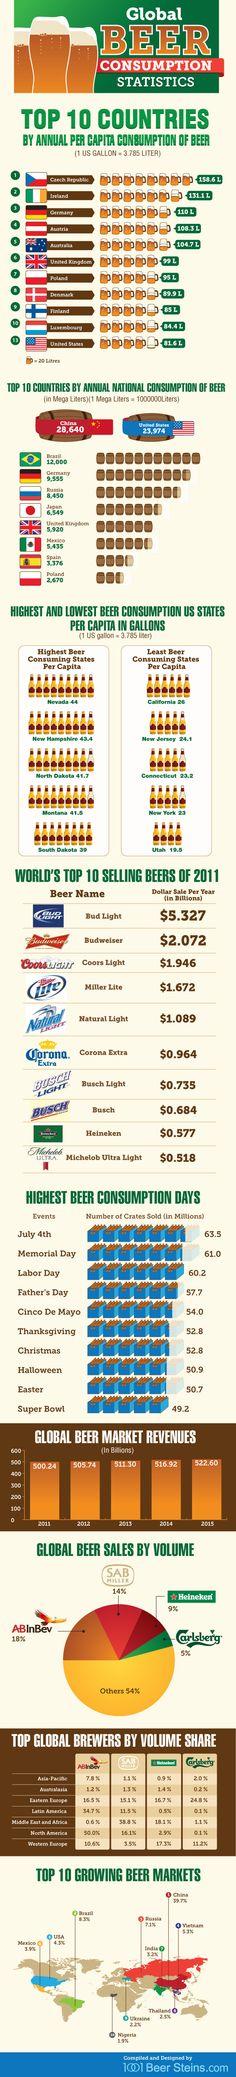 Global Beer Consumption Statistics (infographic from 1001beersteins.com)